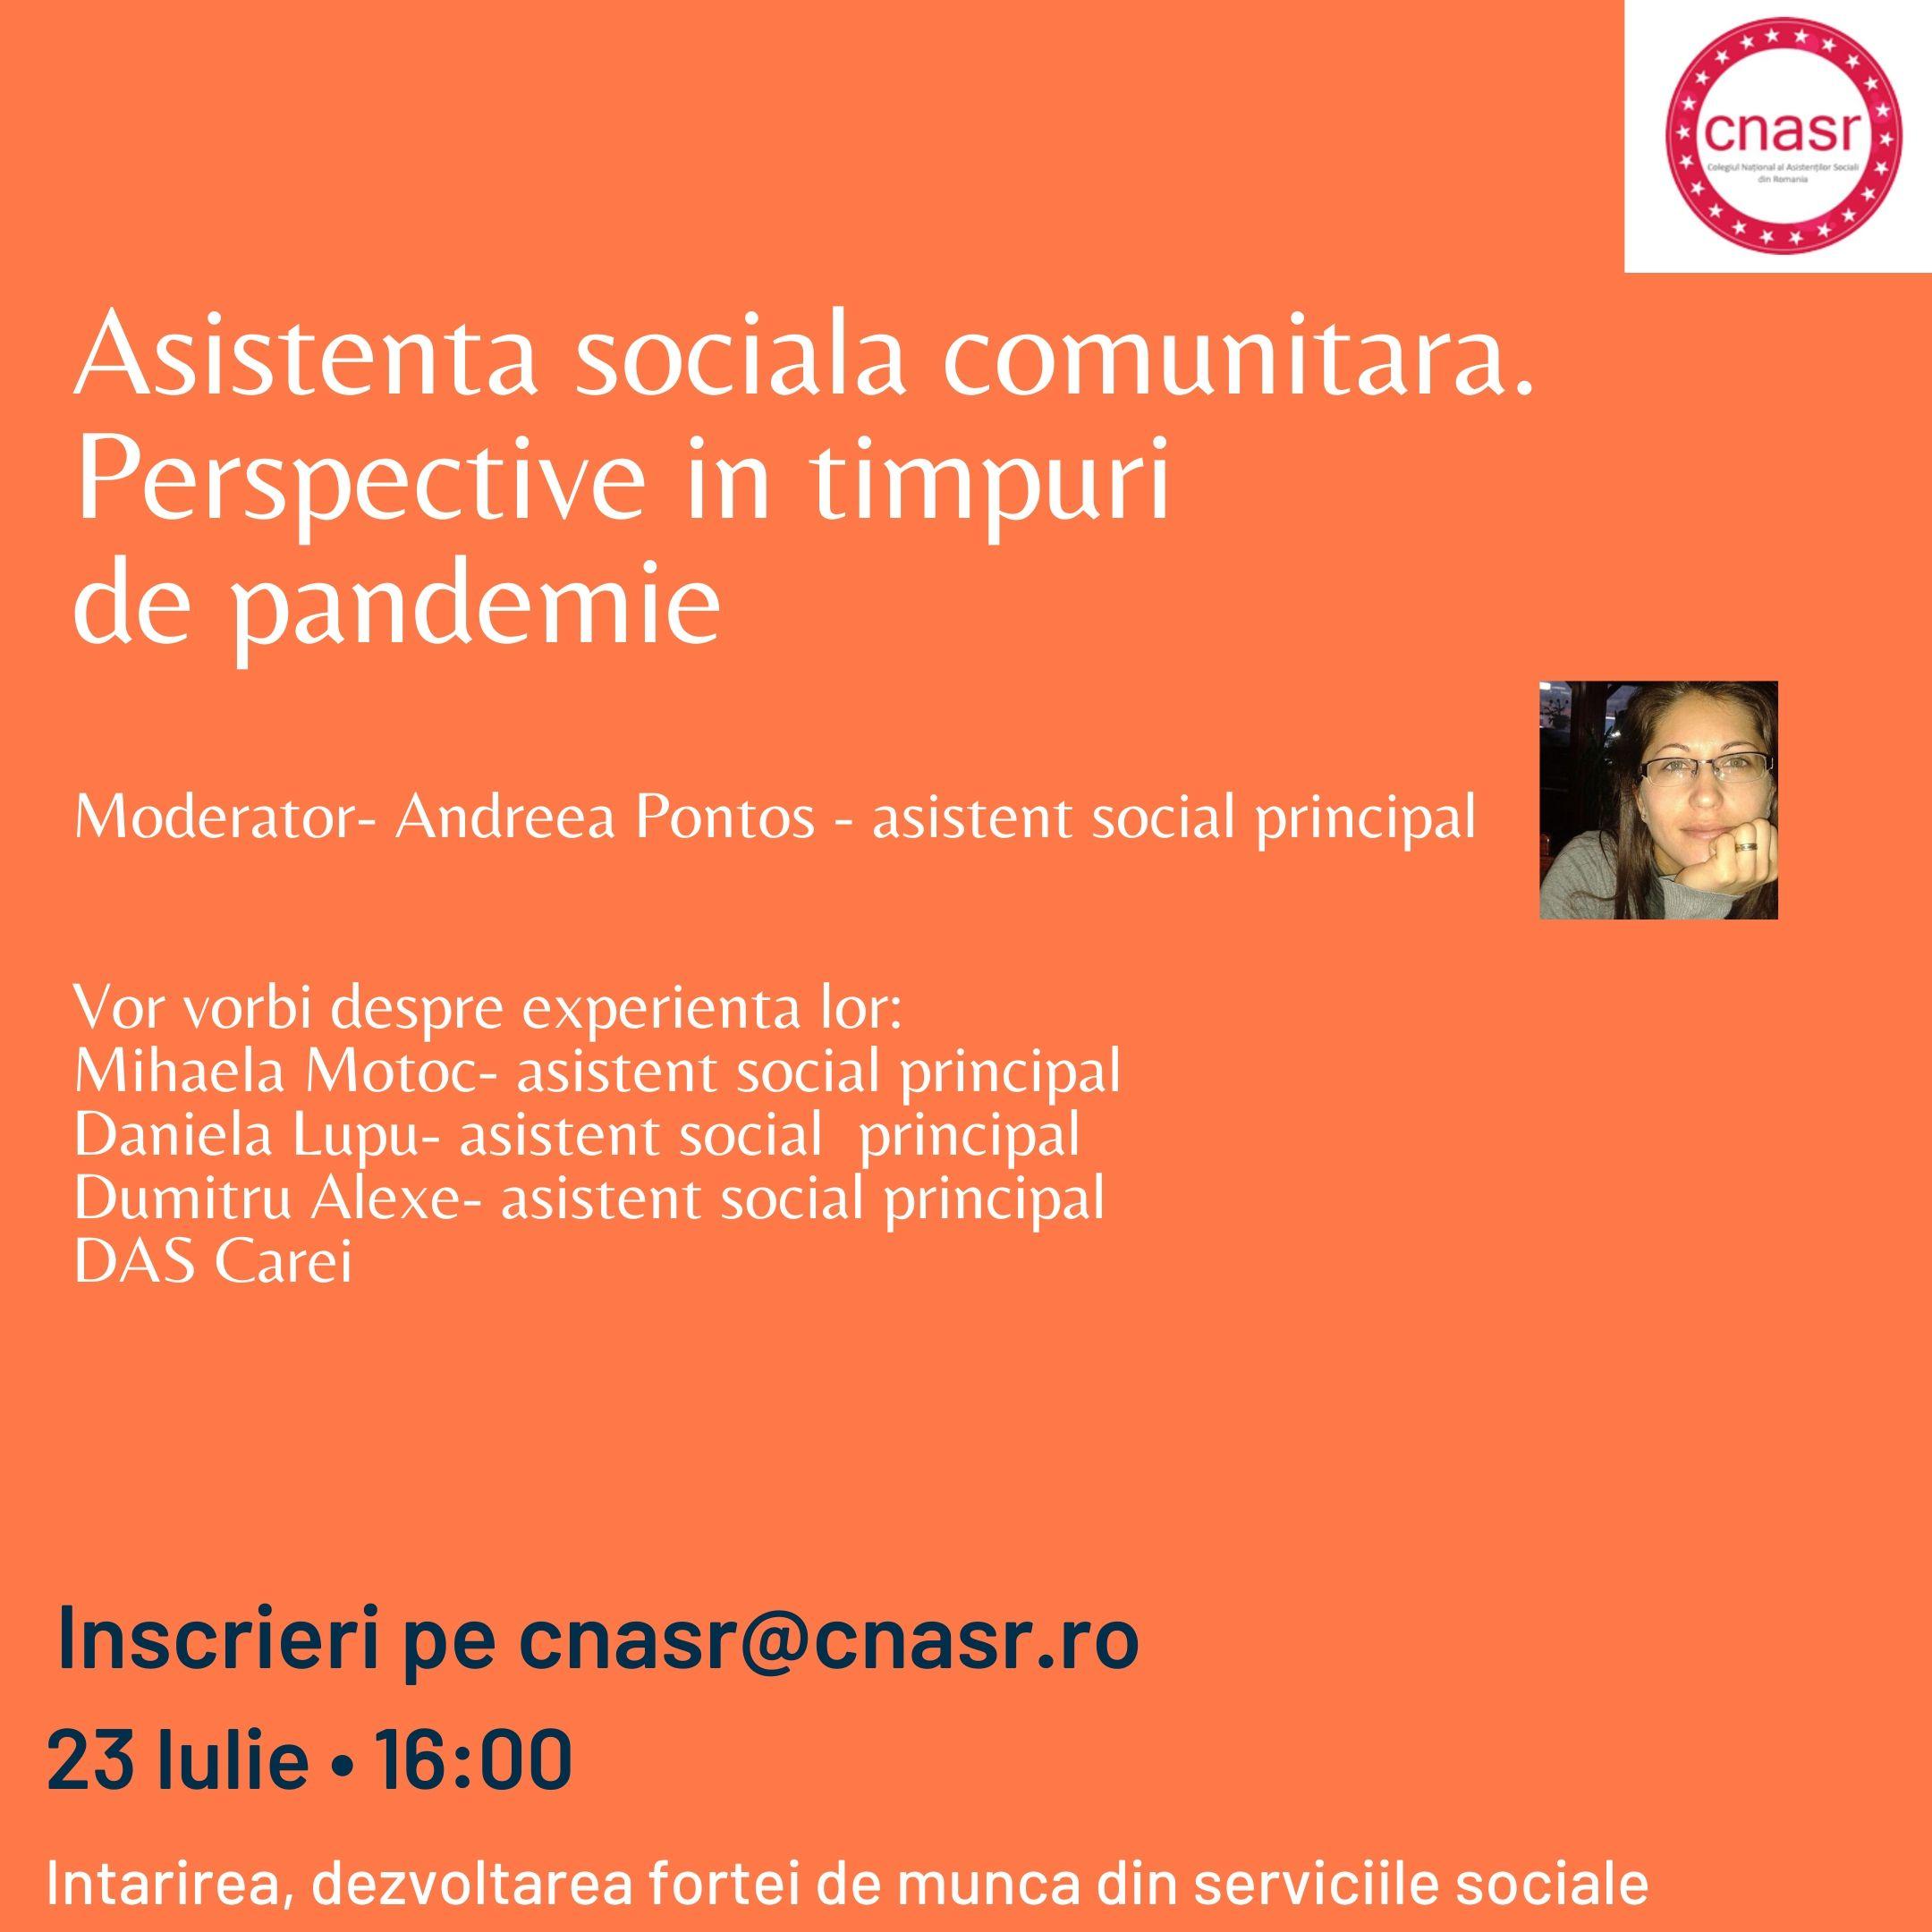 asistenta-sociala-comunitara.-perspective-in-timpuri-de-pandemie-23-iulie.jpg